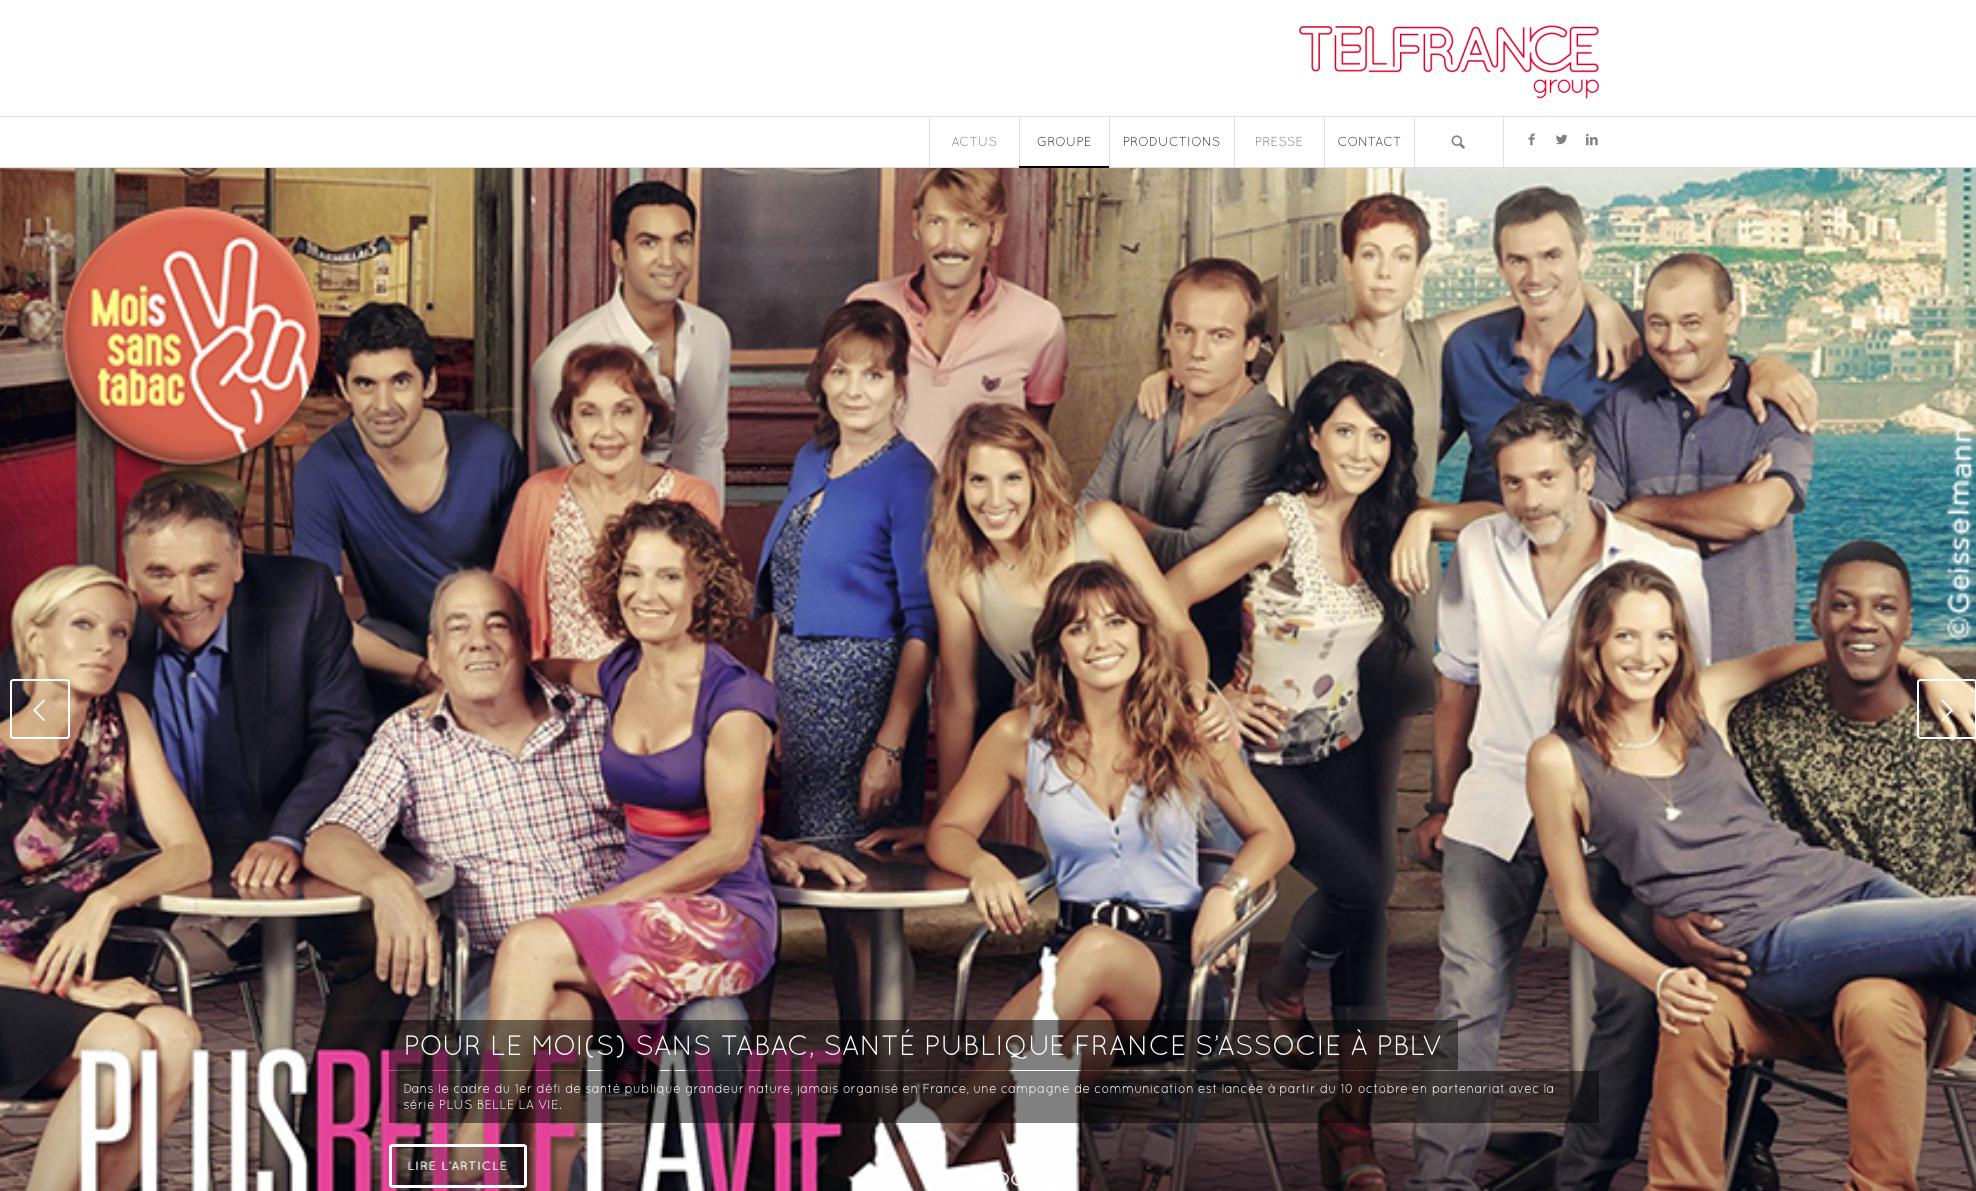 French English translation for Telfrance